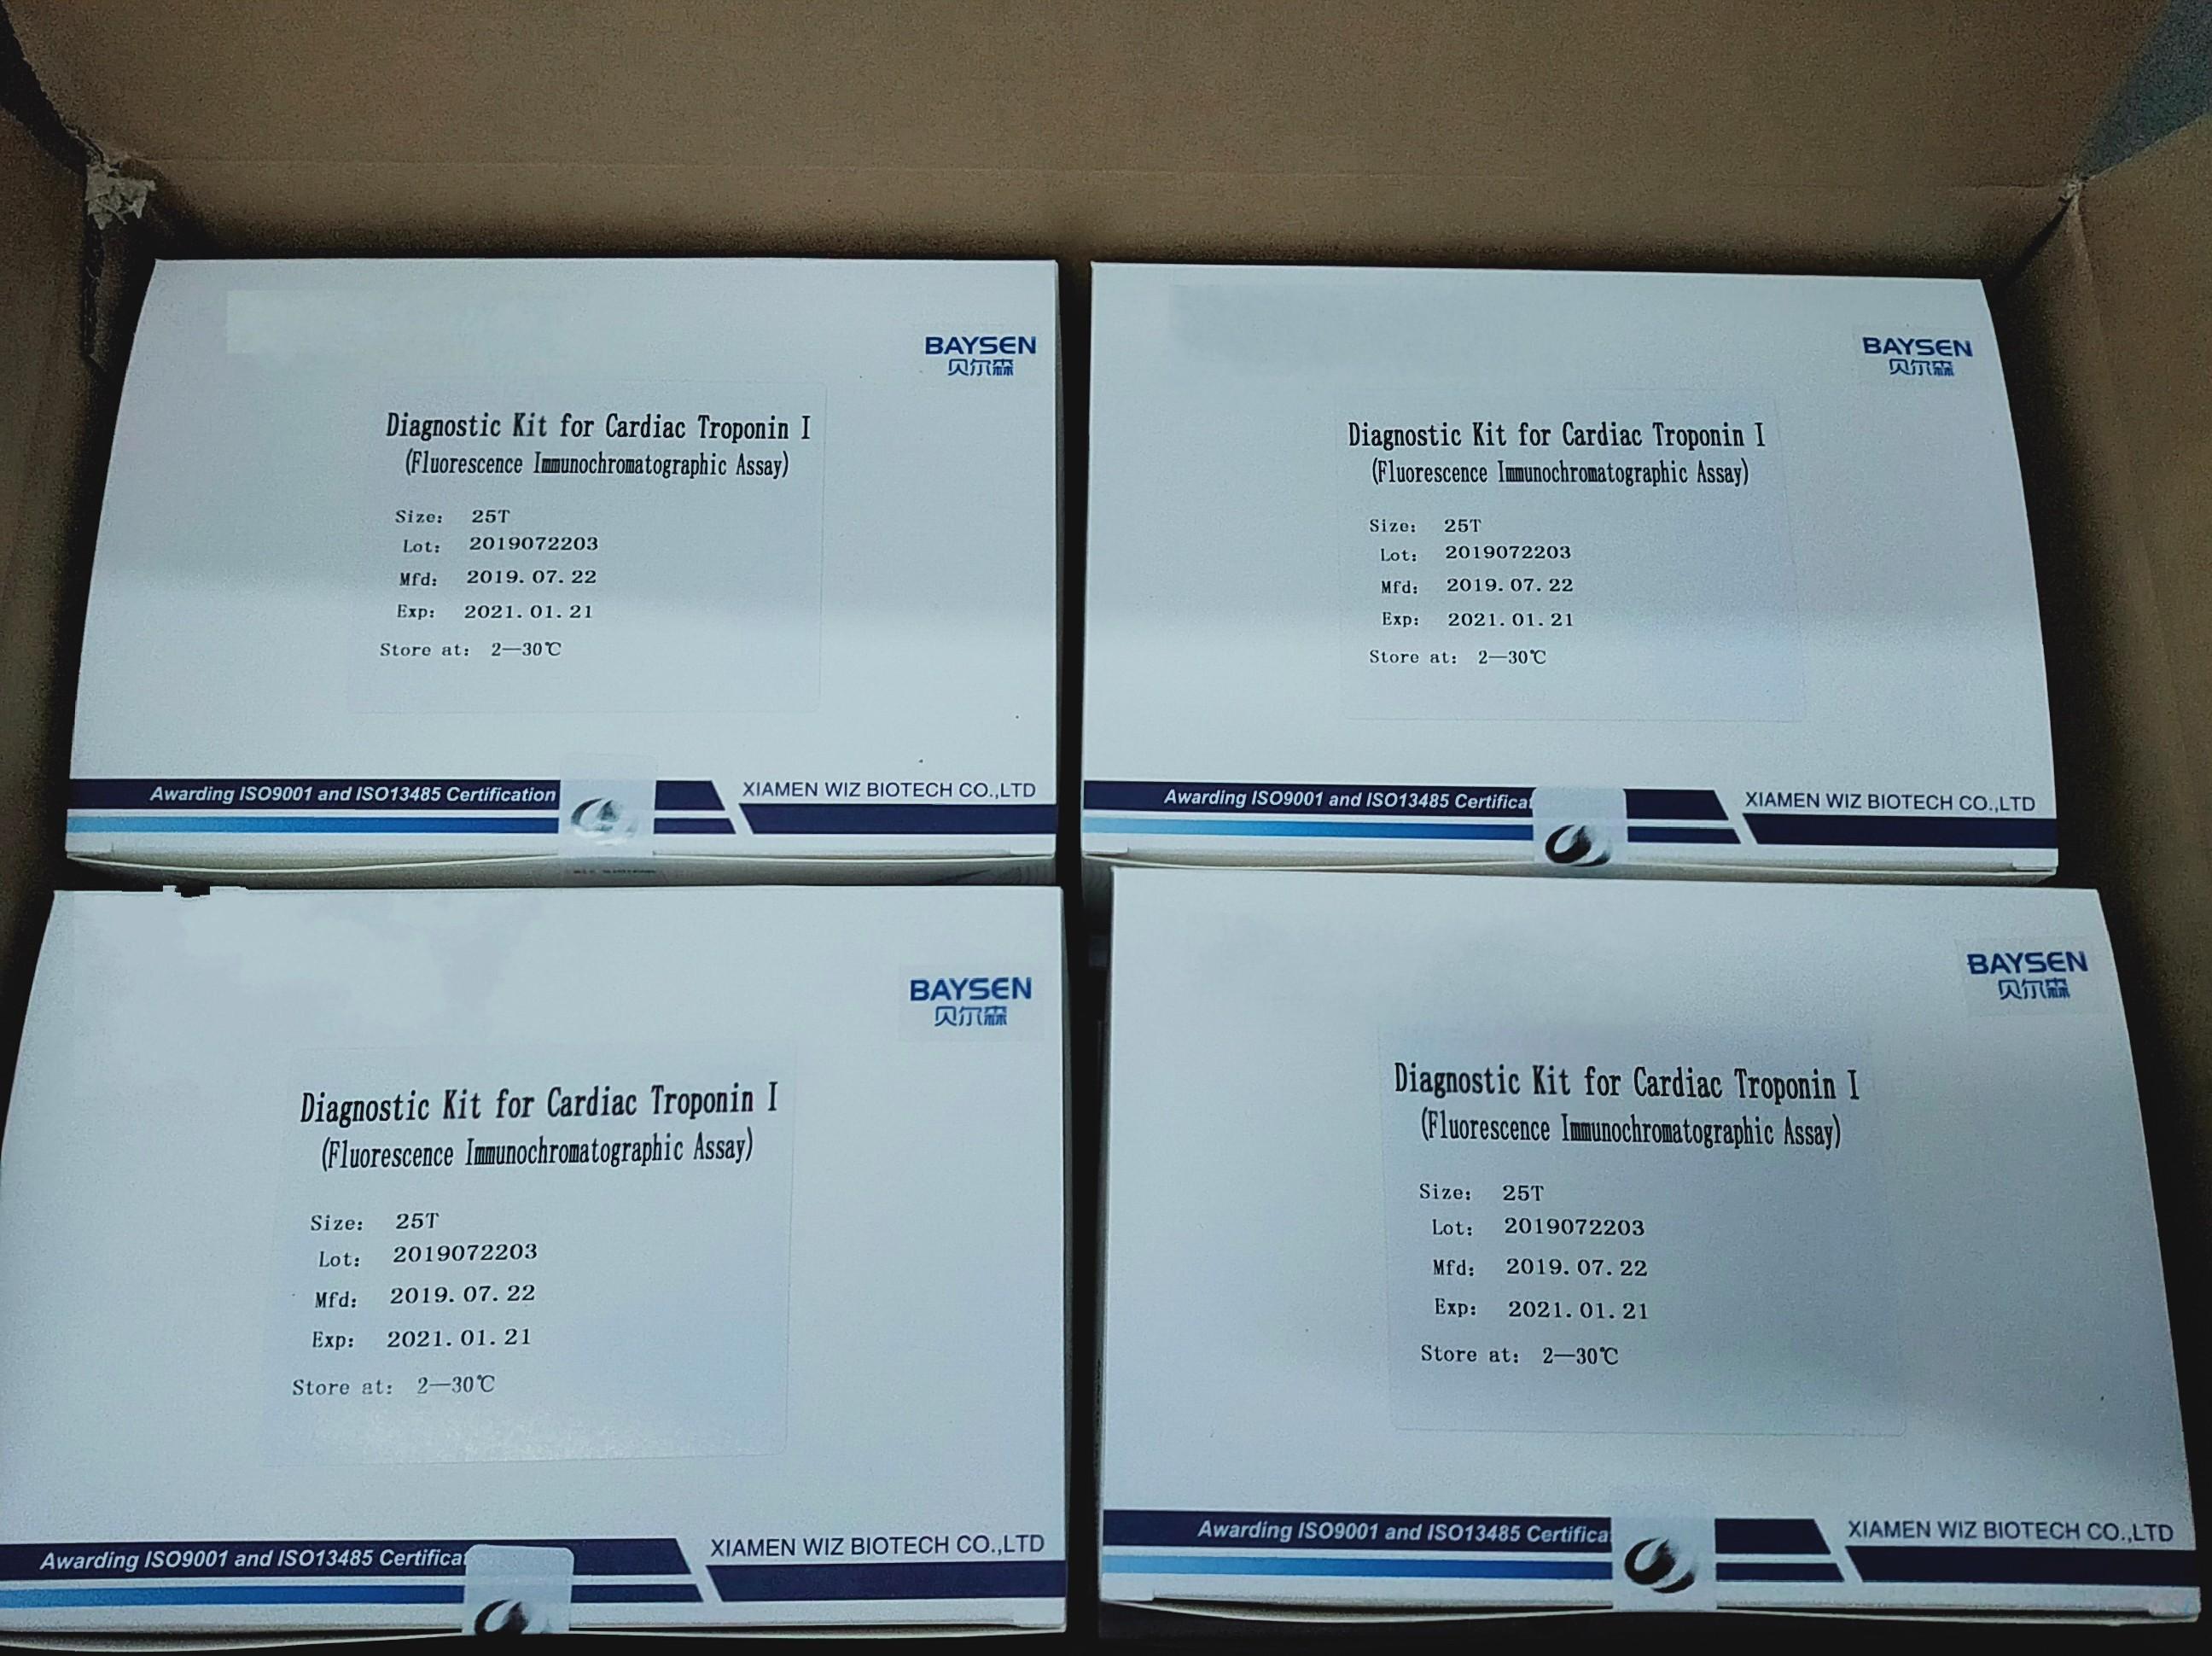 Diagnostic kit for Cardiac Troponin I (cTnl)